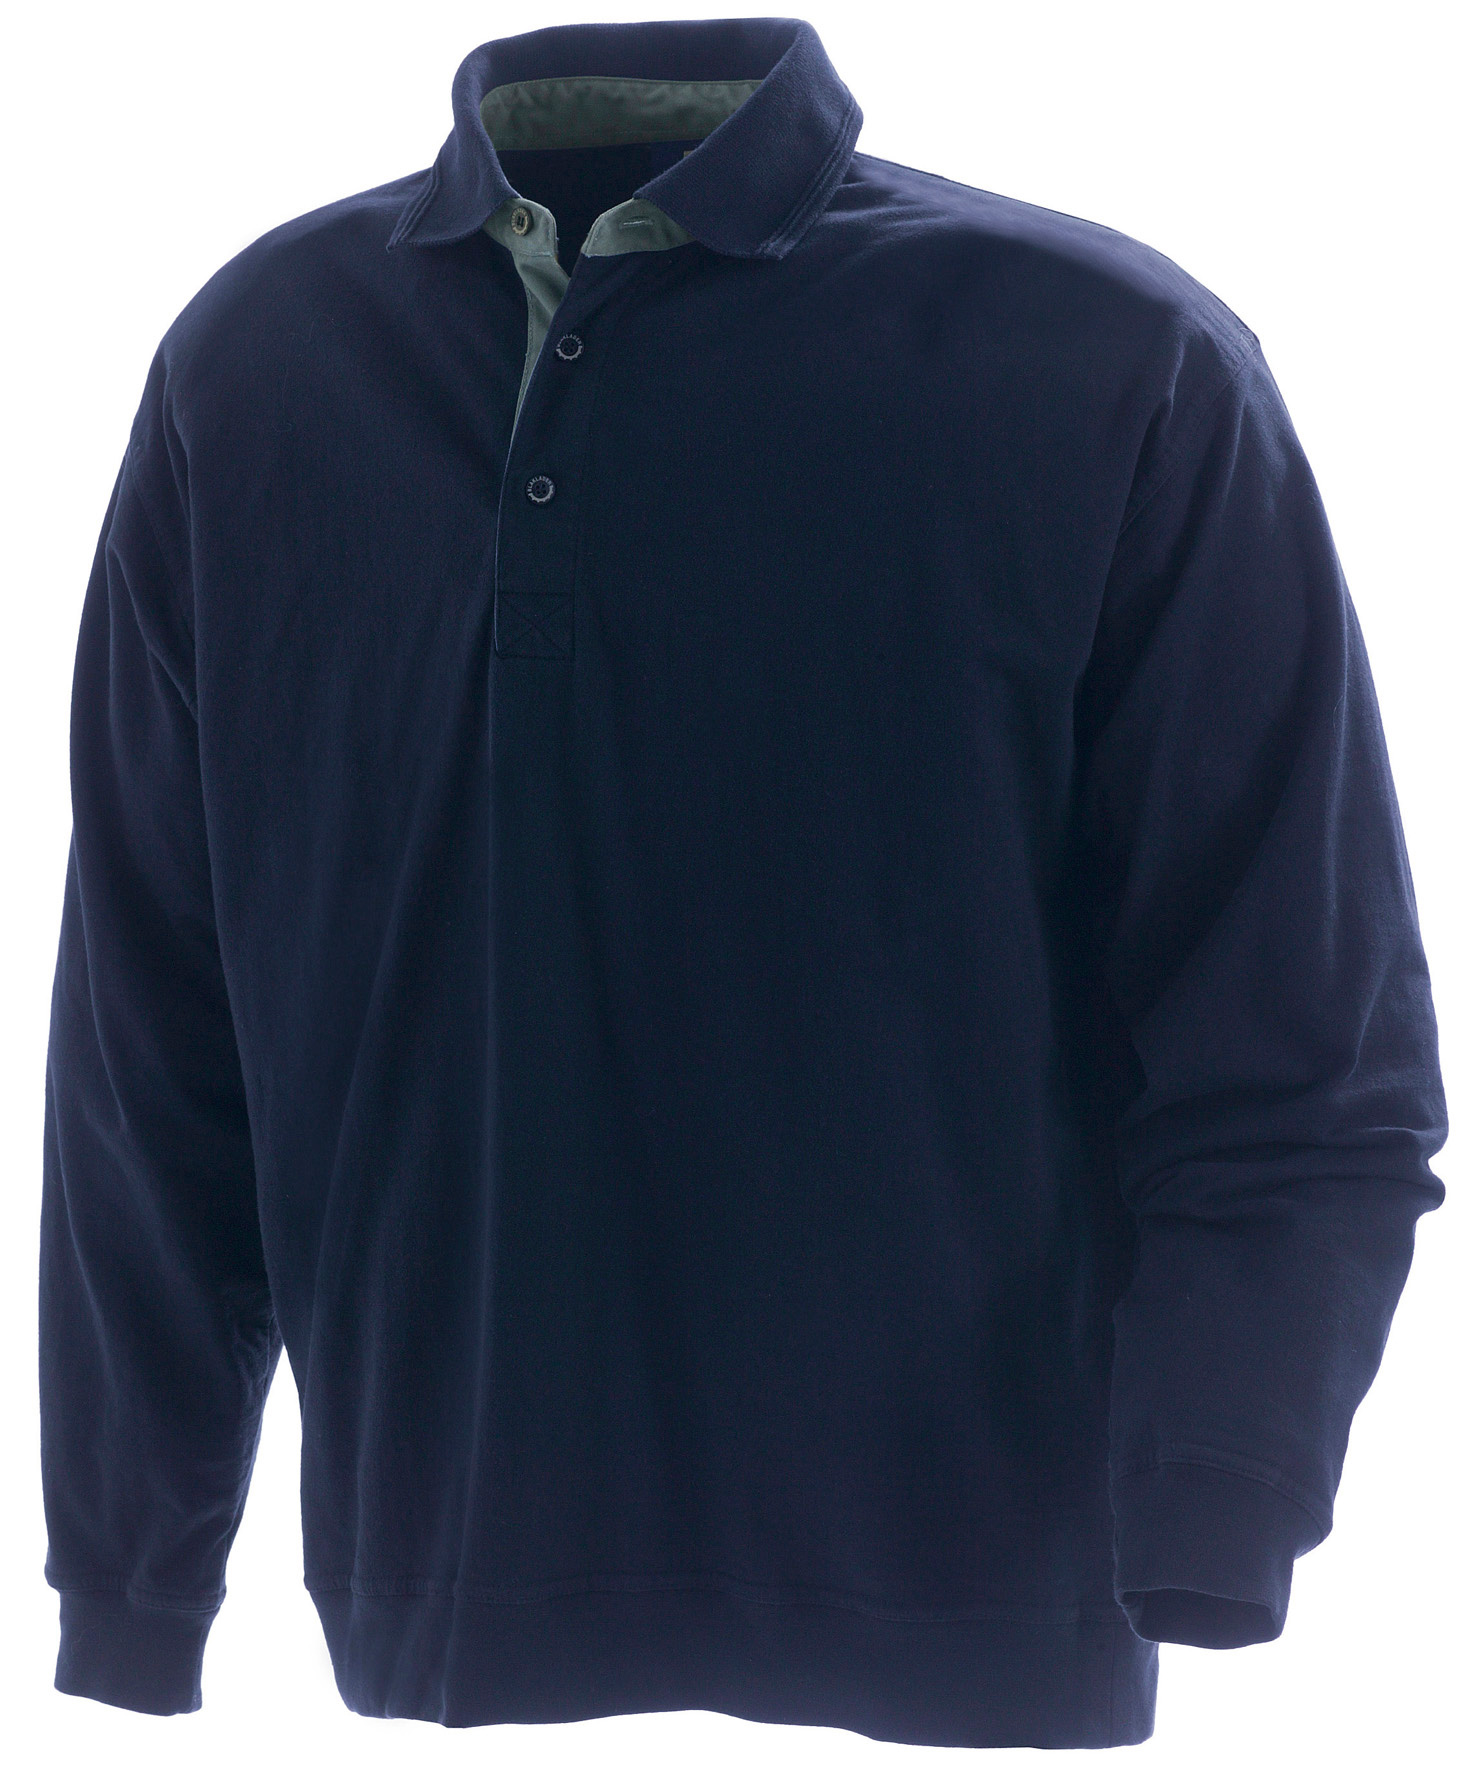 sweatshirt avec col sweat et pull v tements de travail hiver v tements de travail. Black Bedroom Furniture Sets. Home Design Ideas